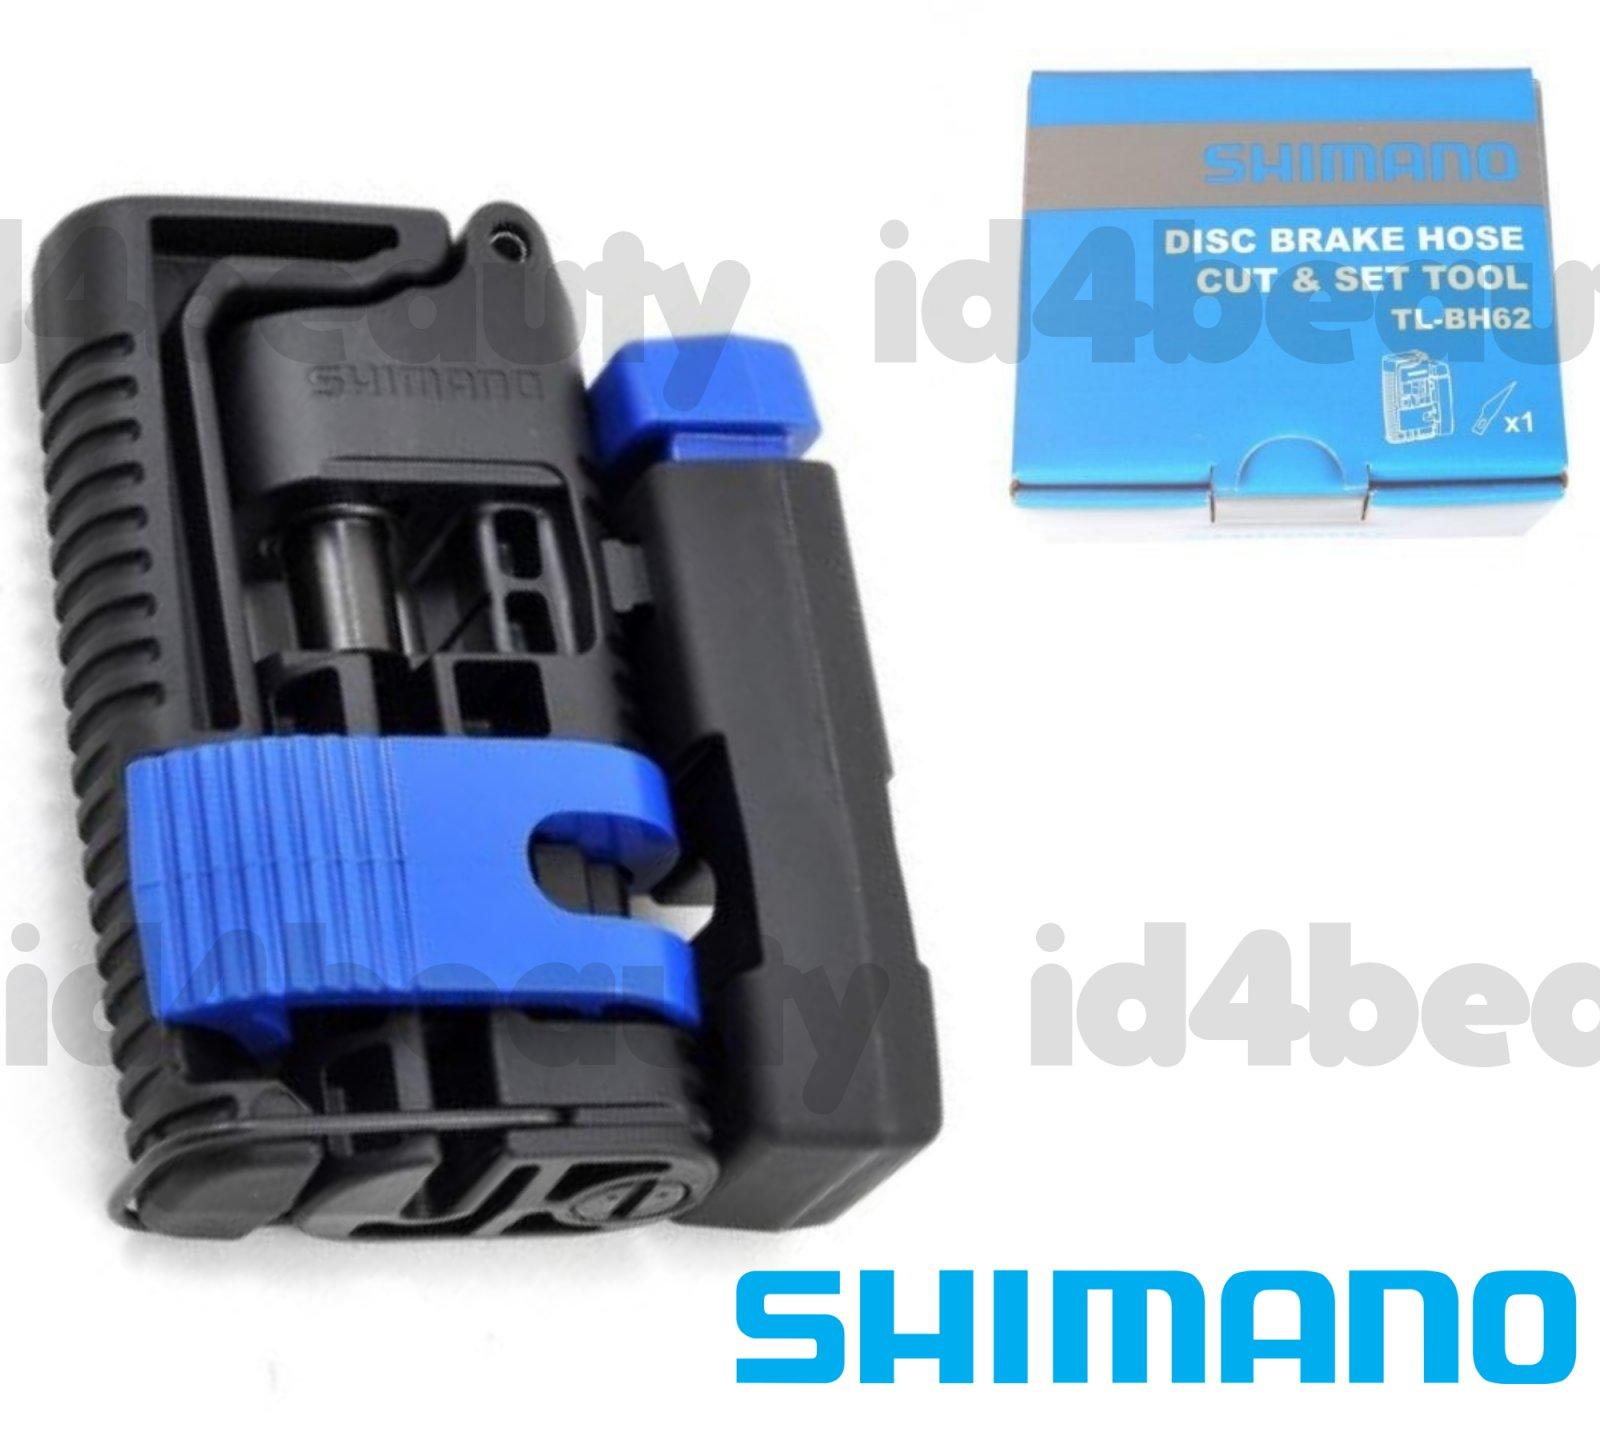 Details about TL-BH62 Shimano Disc Brake Hose Cutting/Insert Tool NIB  (Y13098570)